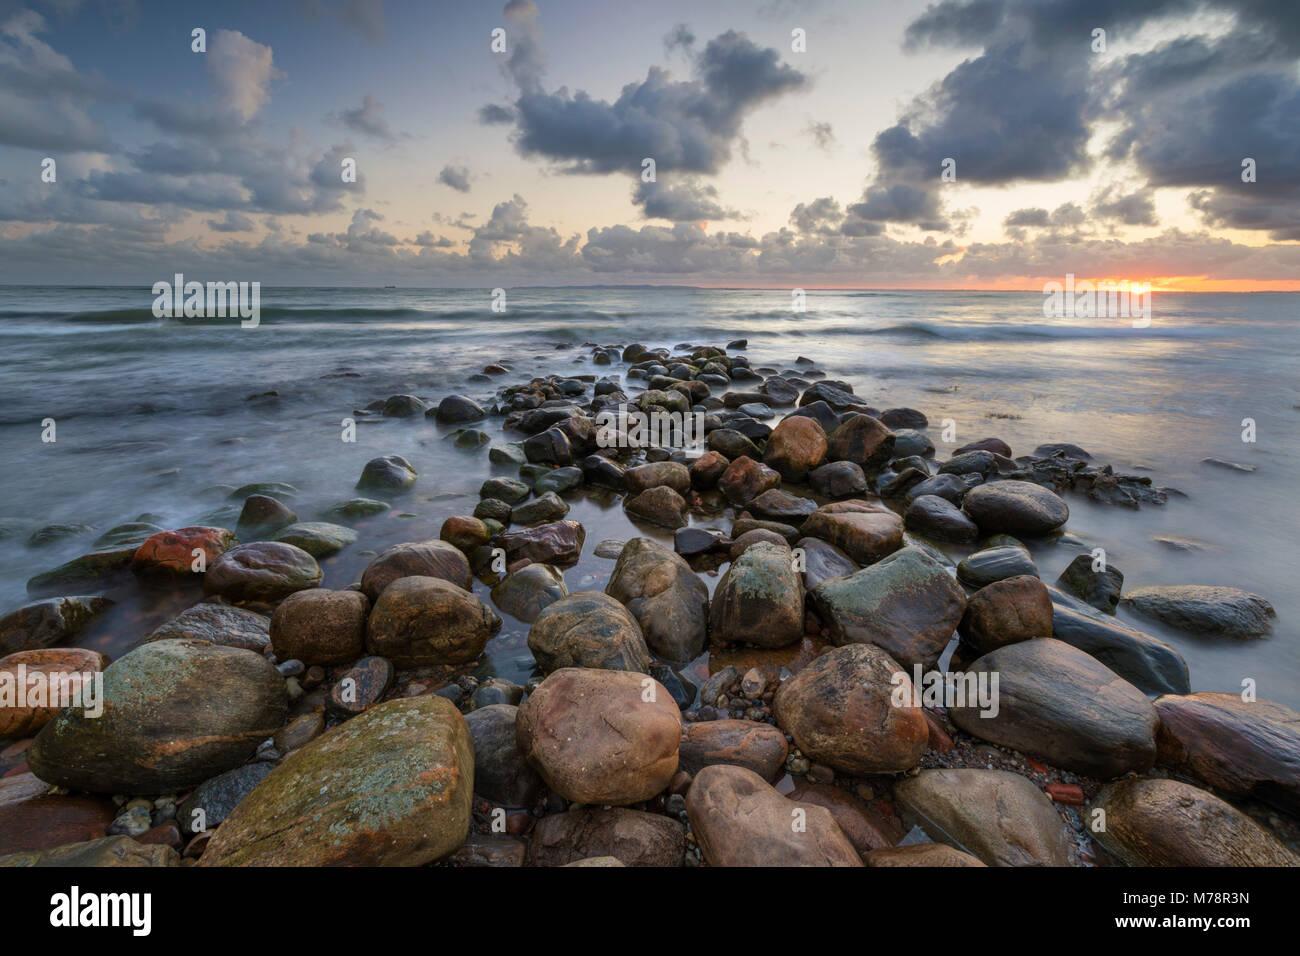 Rompeolas de roca en el mar, al amanecer, Kattegat Munkerup Costa, Zelanda, Dinamarca, Escandinavia, Europa Imagen De Stock